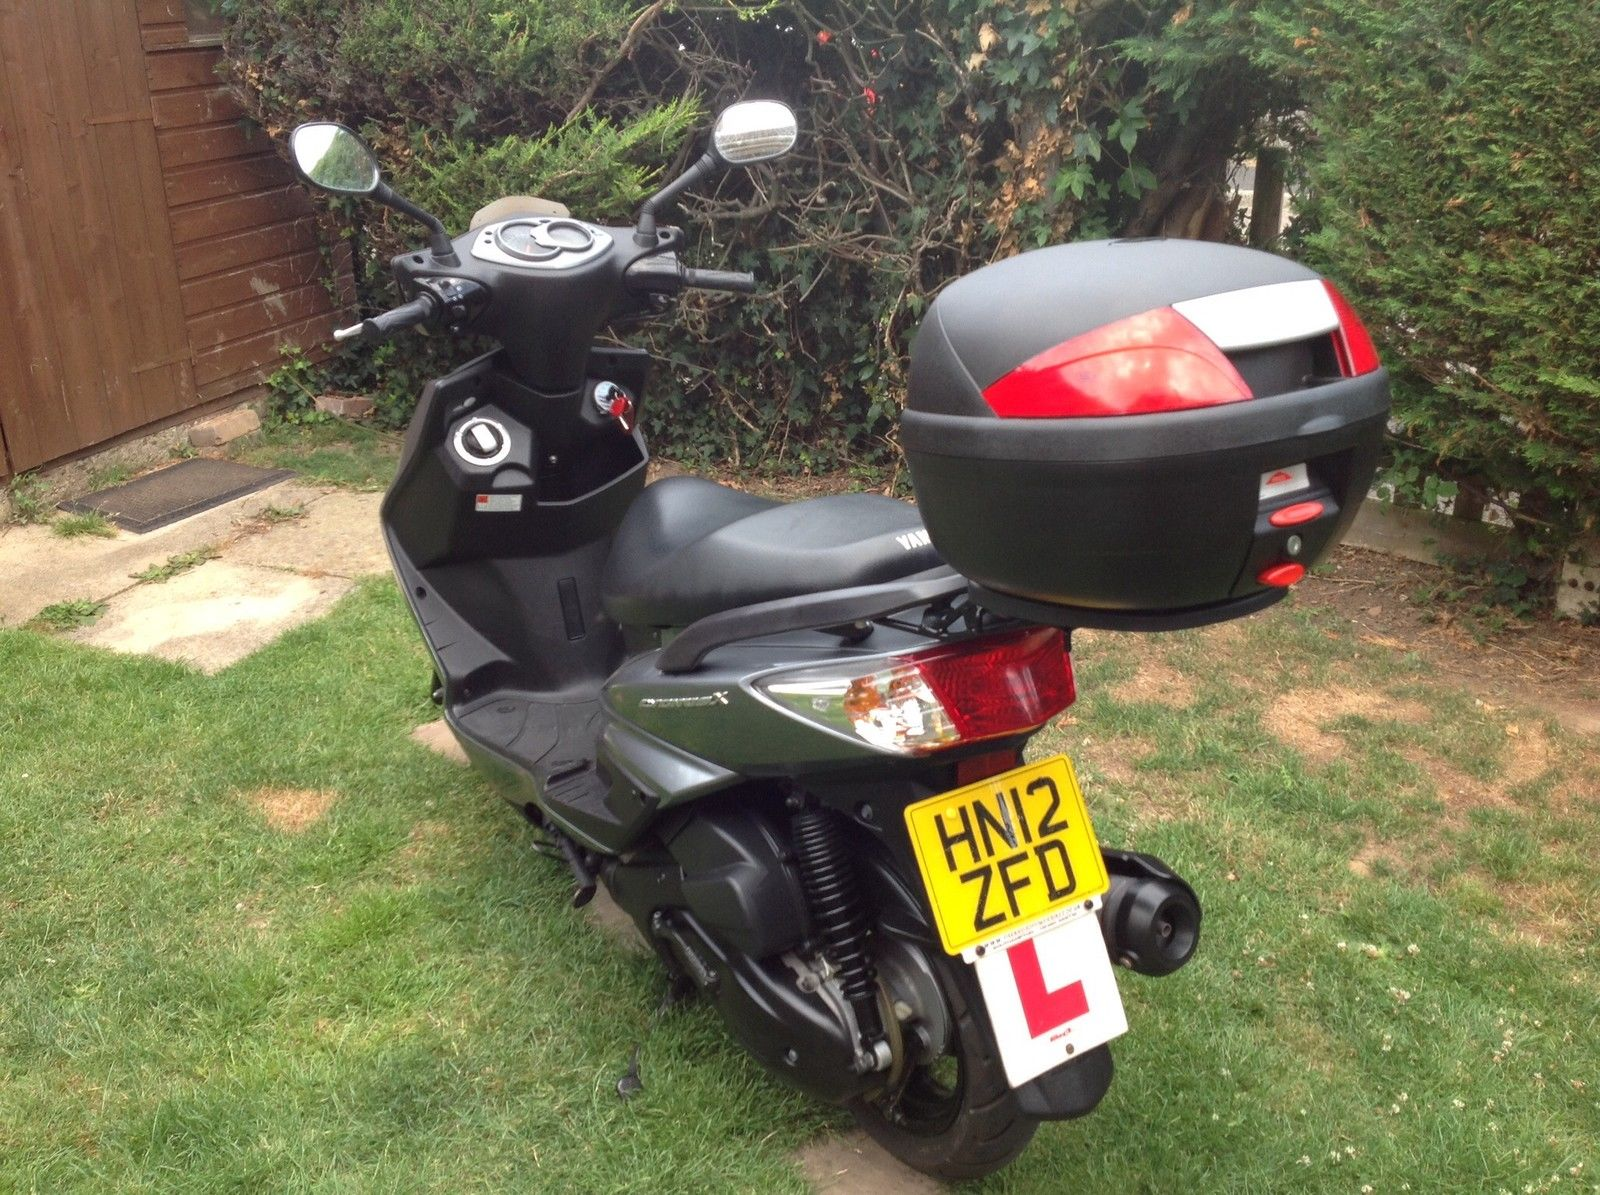 Yamaha cygnus xc125 twist and go scooter for Nh yamaha dealers